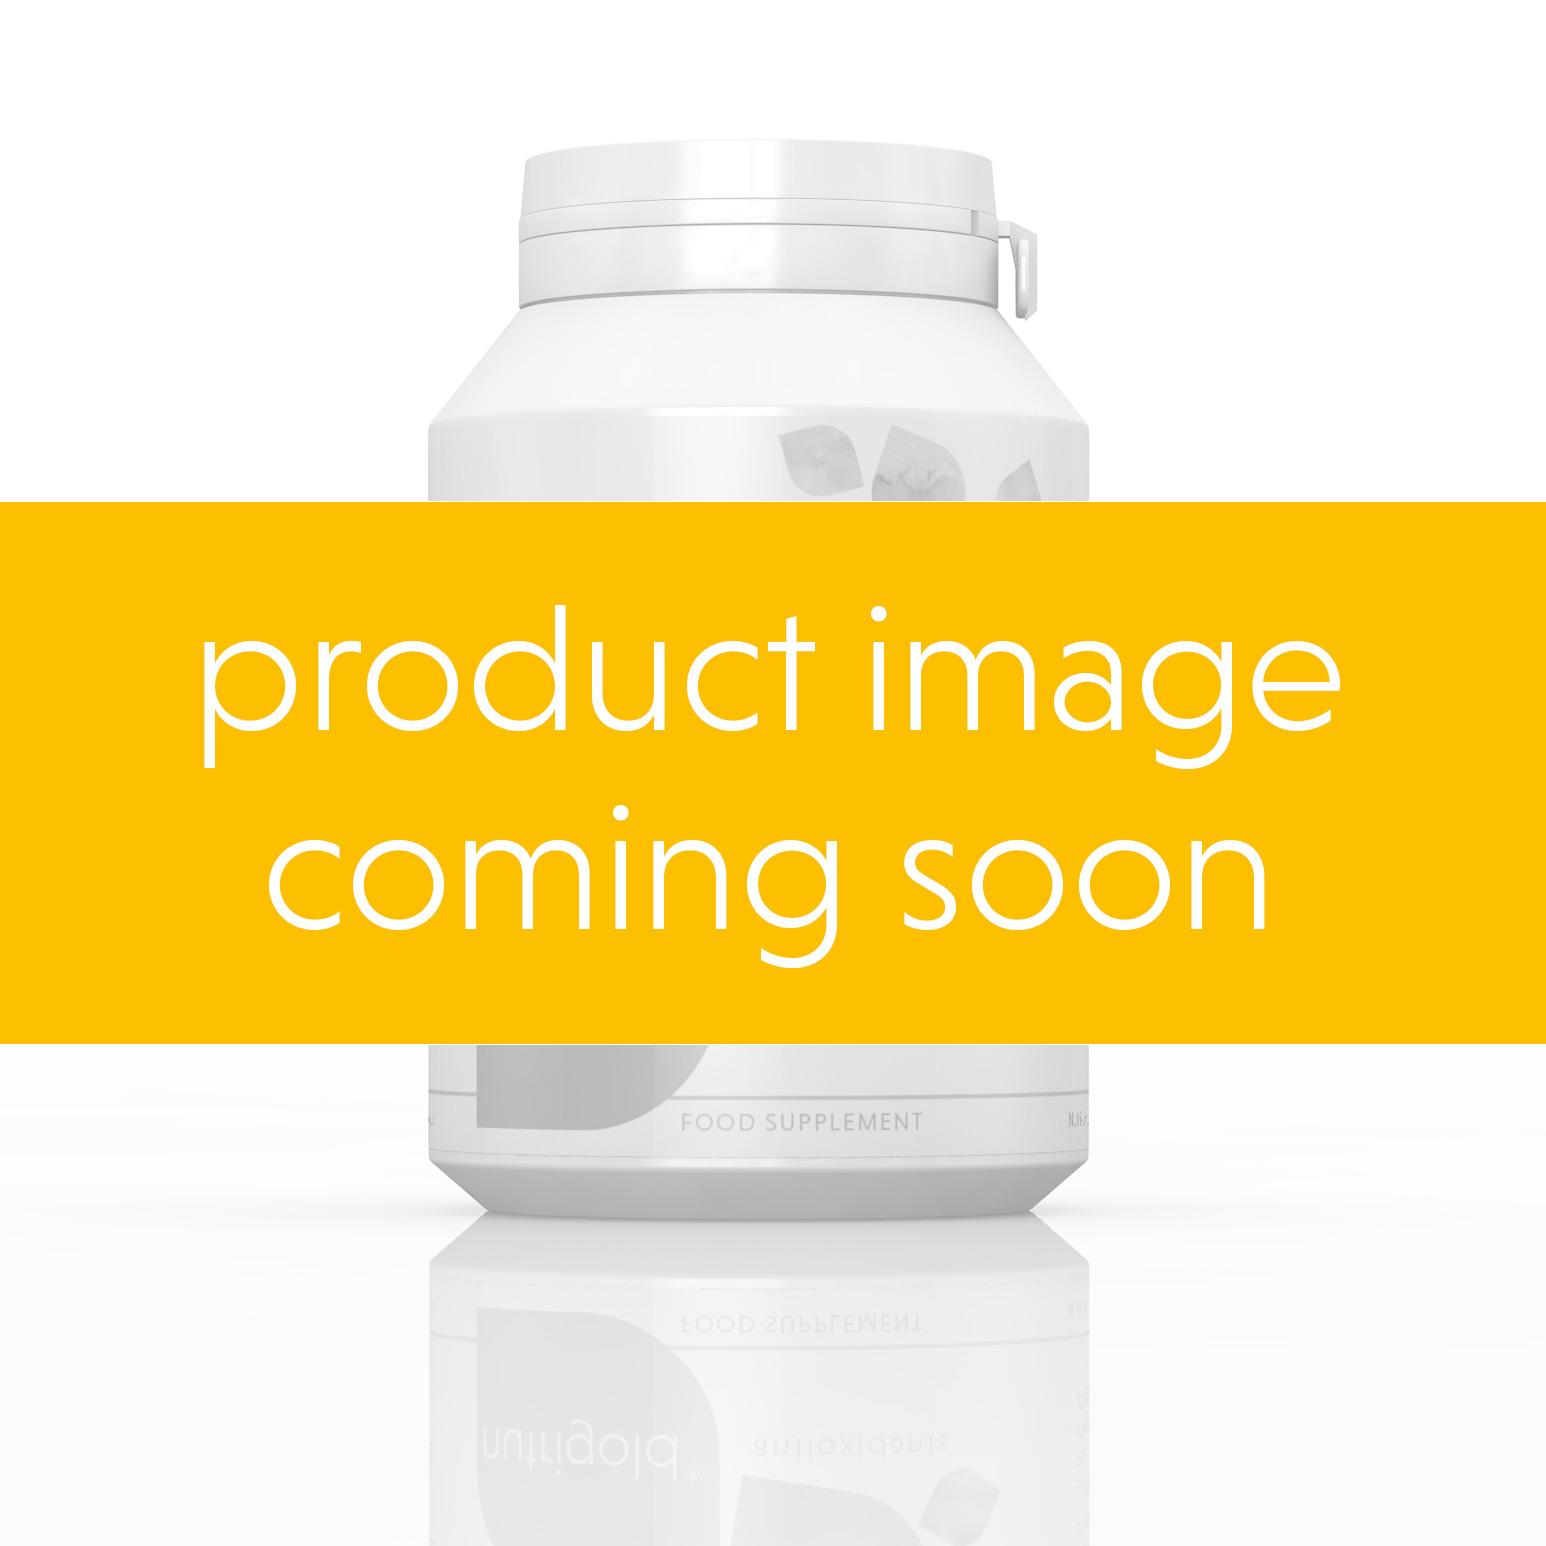 Consultation: 30 Minute Product Consultation